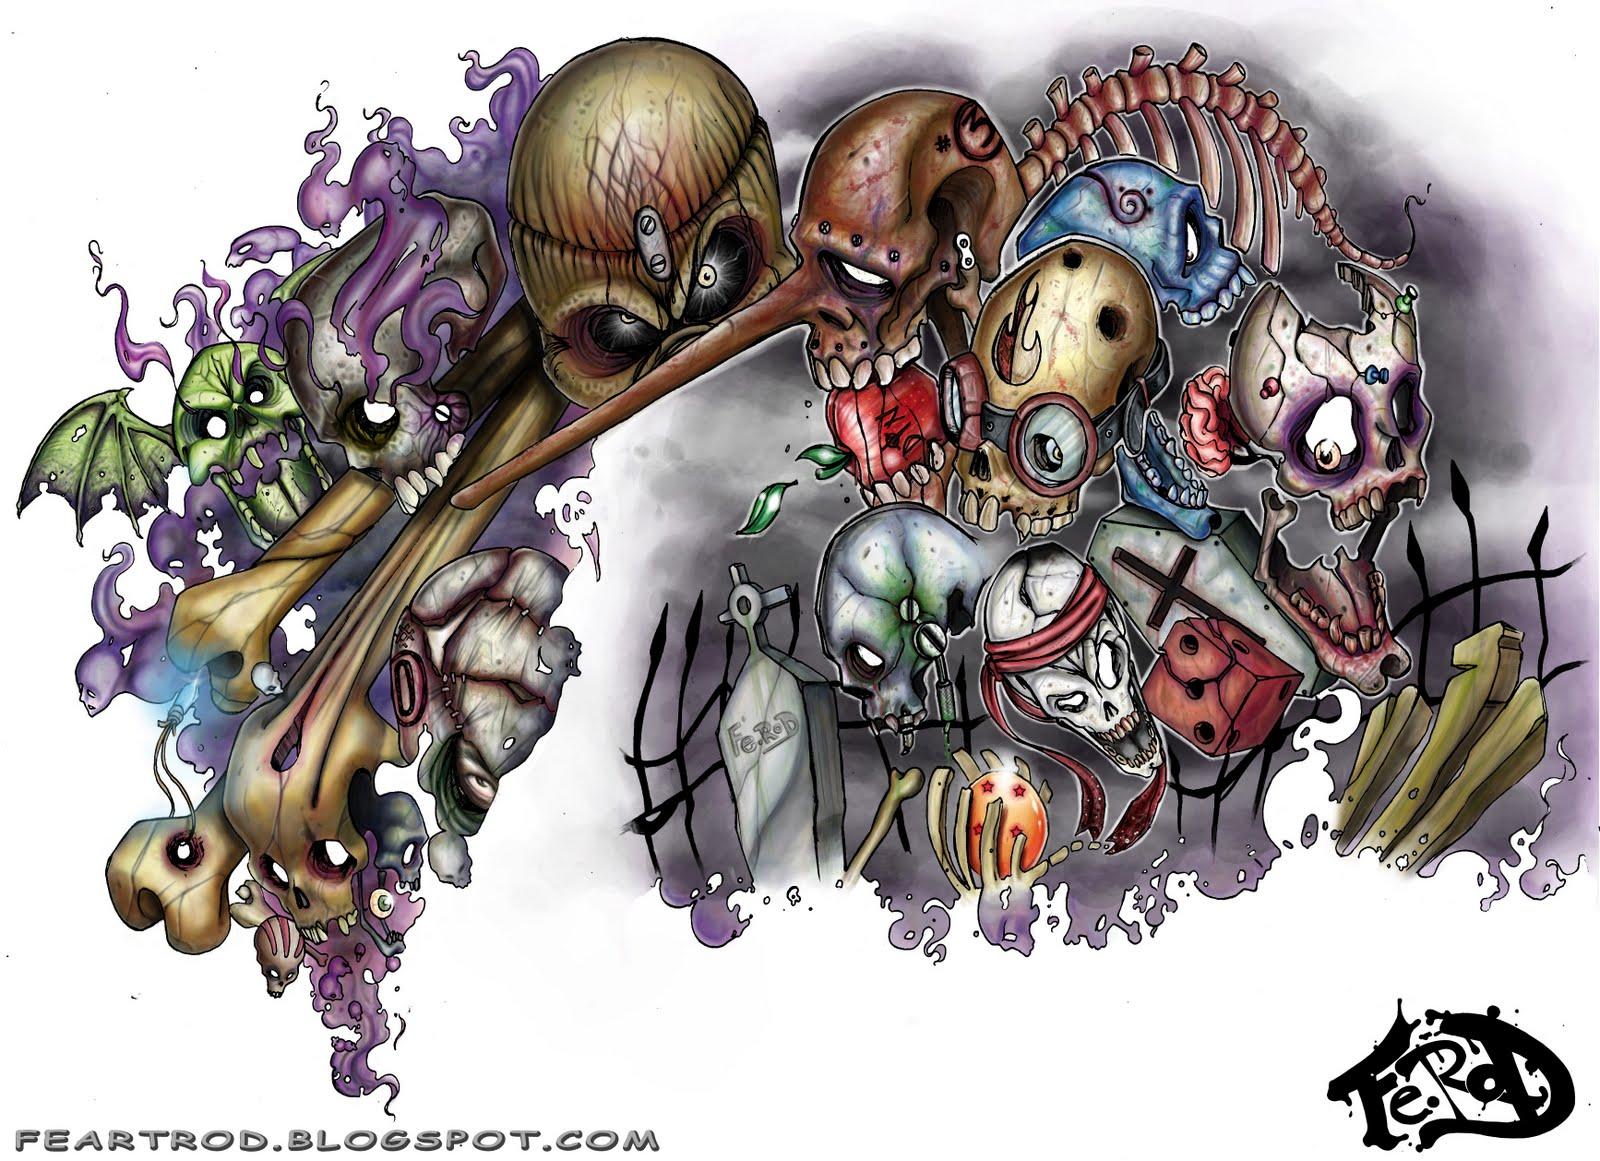 http://4.bp.blogspot.com/__otL_g94gSc/TEhhPdbMz1I/AAAAAAAAAbU/9gLXejlbPjQ/s1600/RoD+Tatoo_By+Fe.RoD.jpg